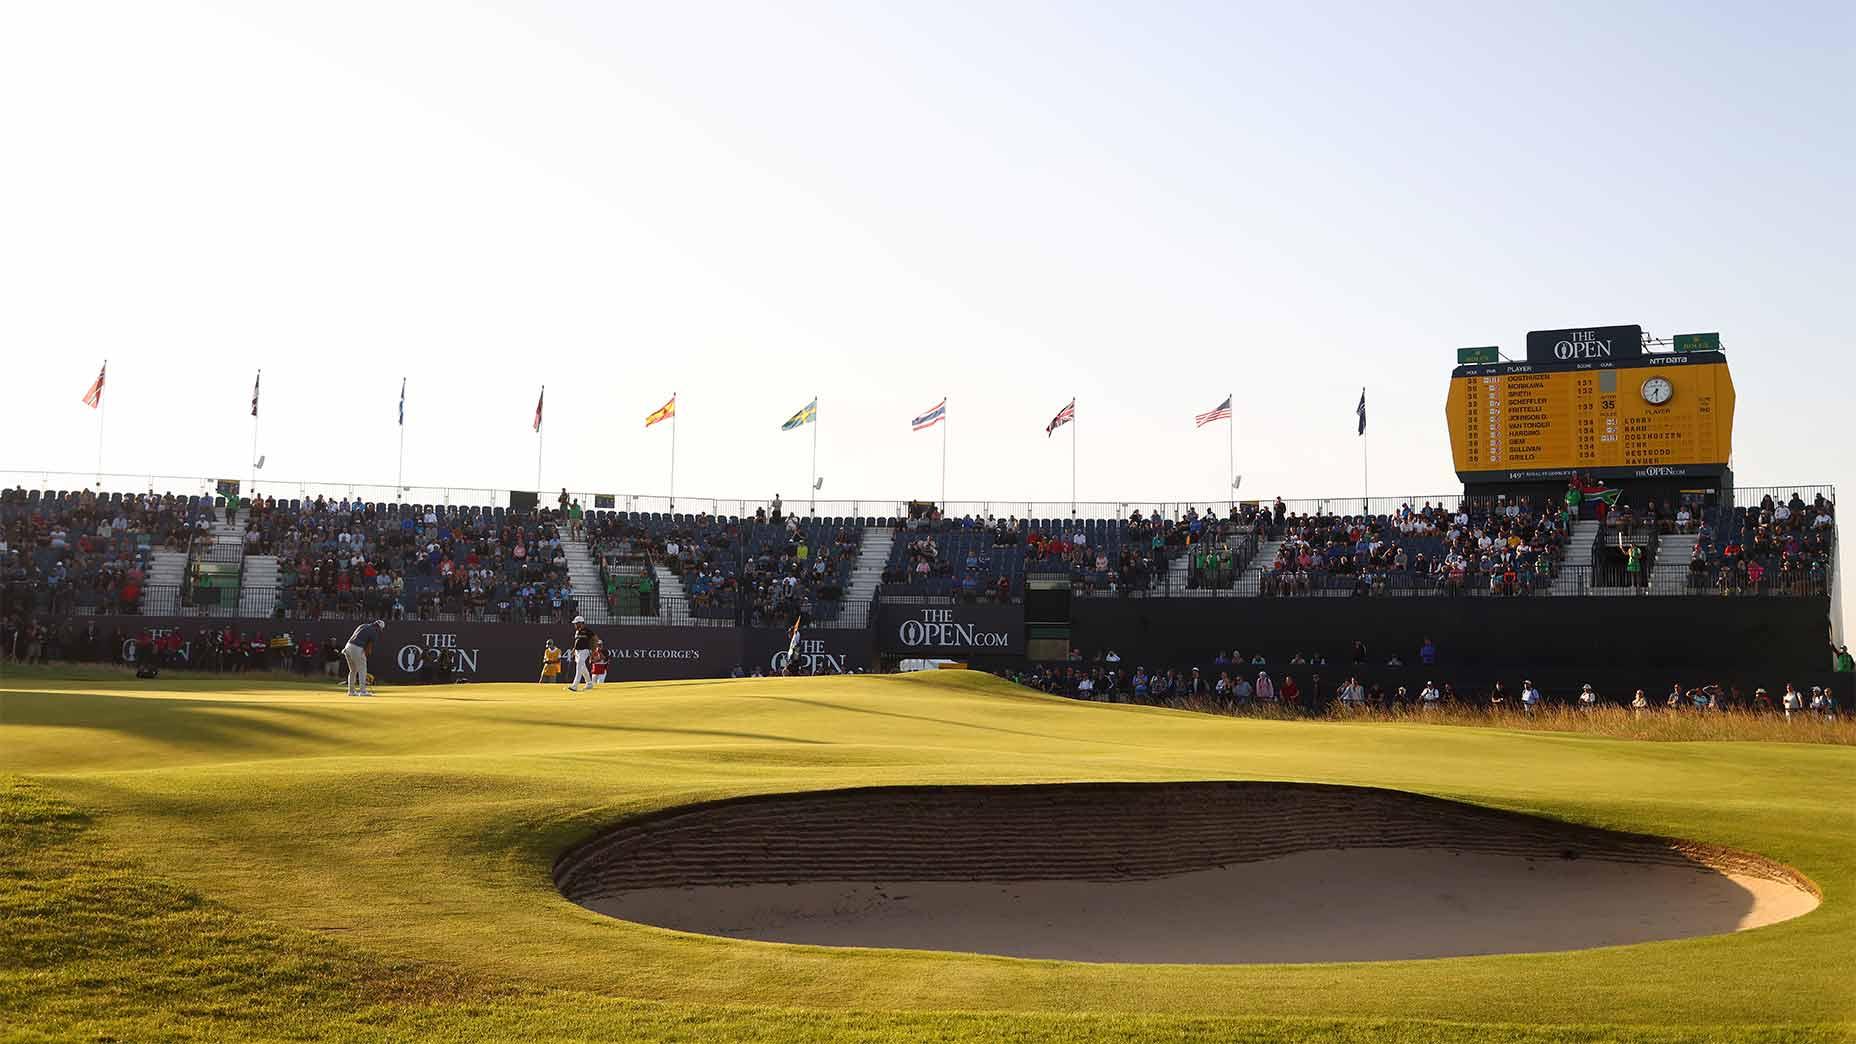 Royal st george's 18th hole